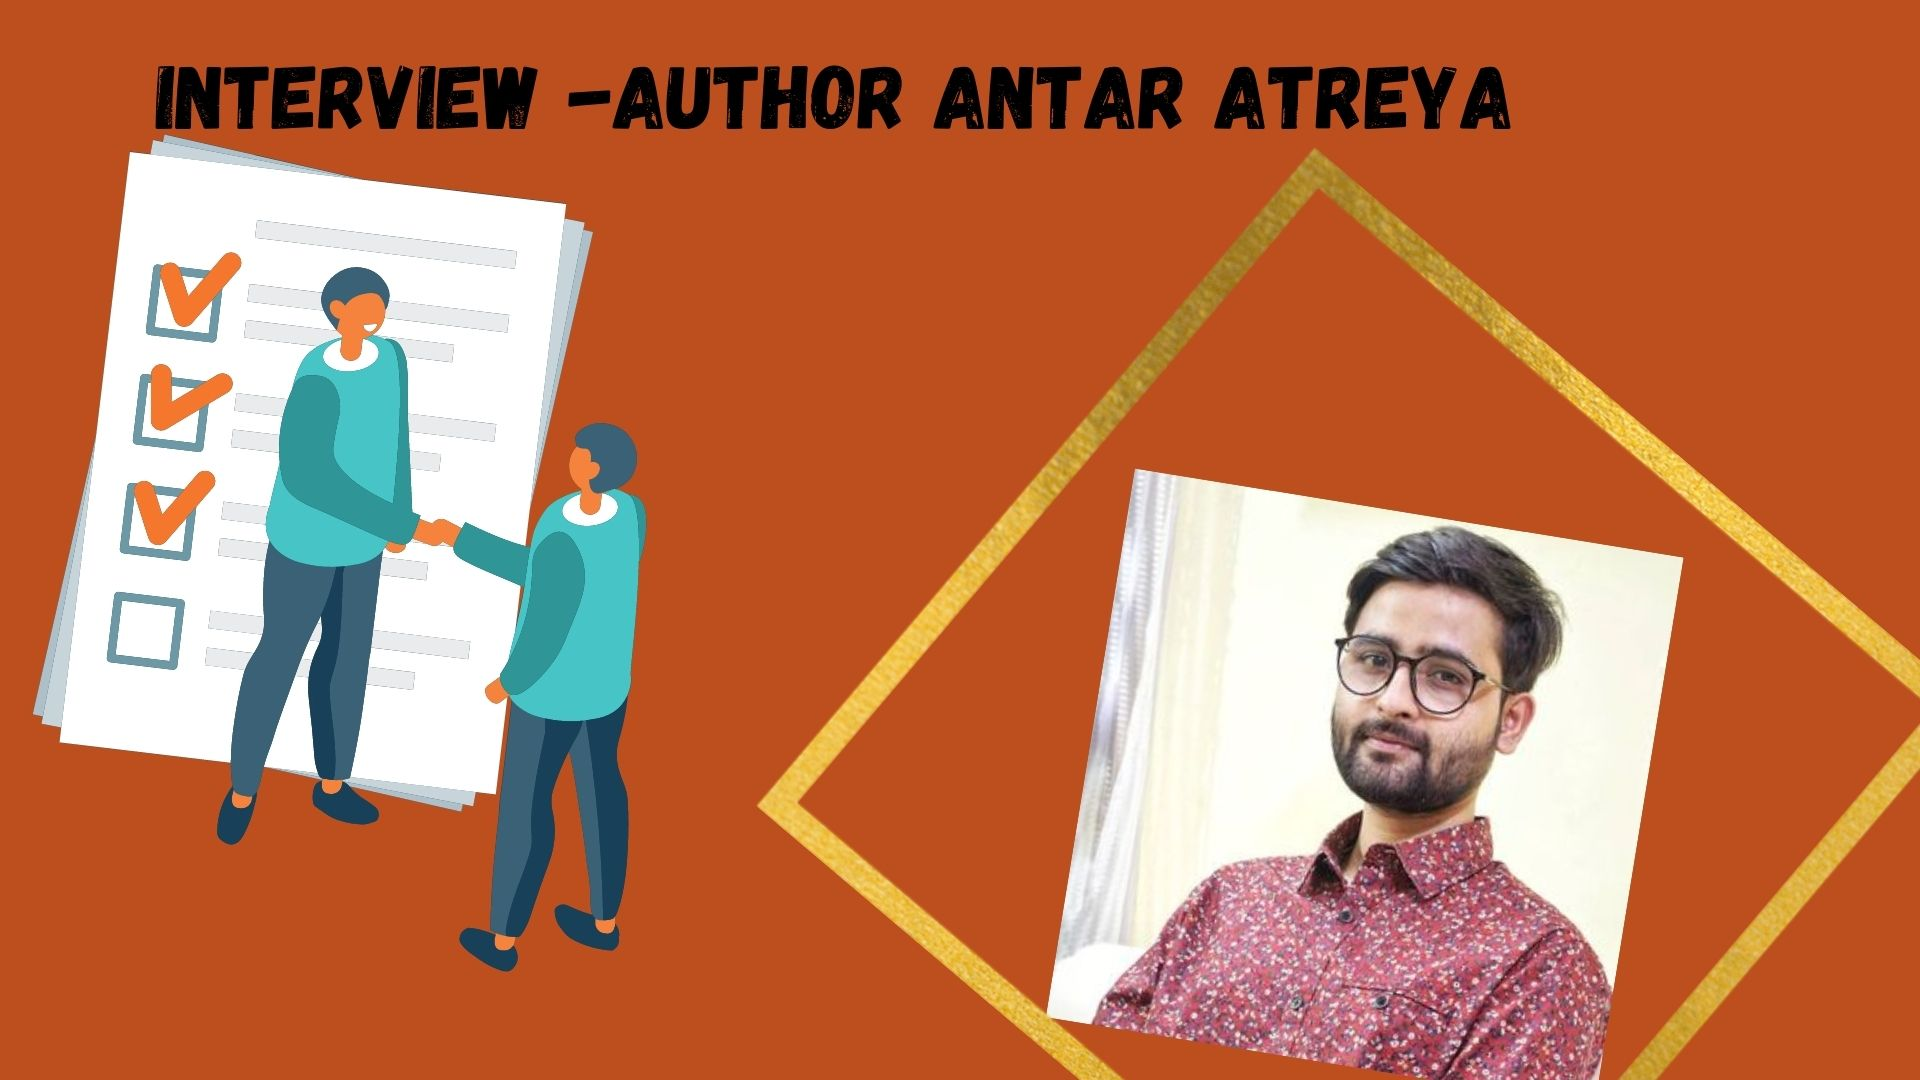 INTERVIEW -AUTHOR ANTAR ATREYA